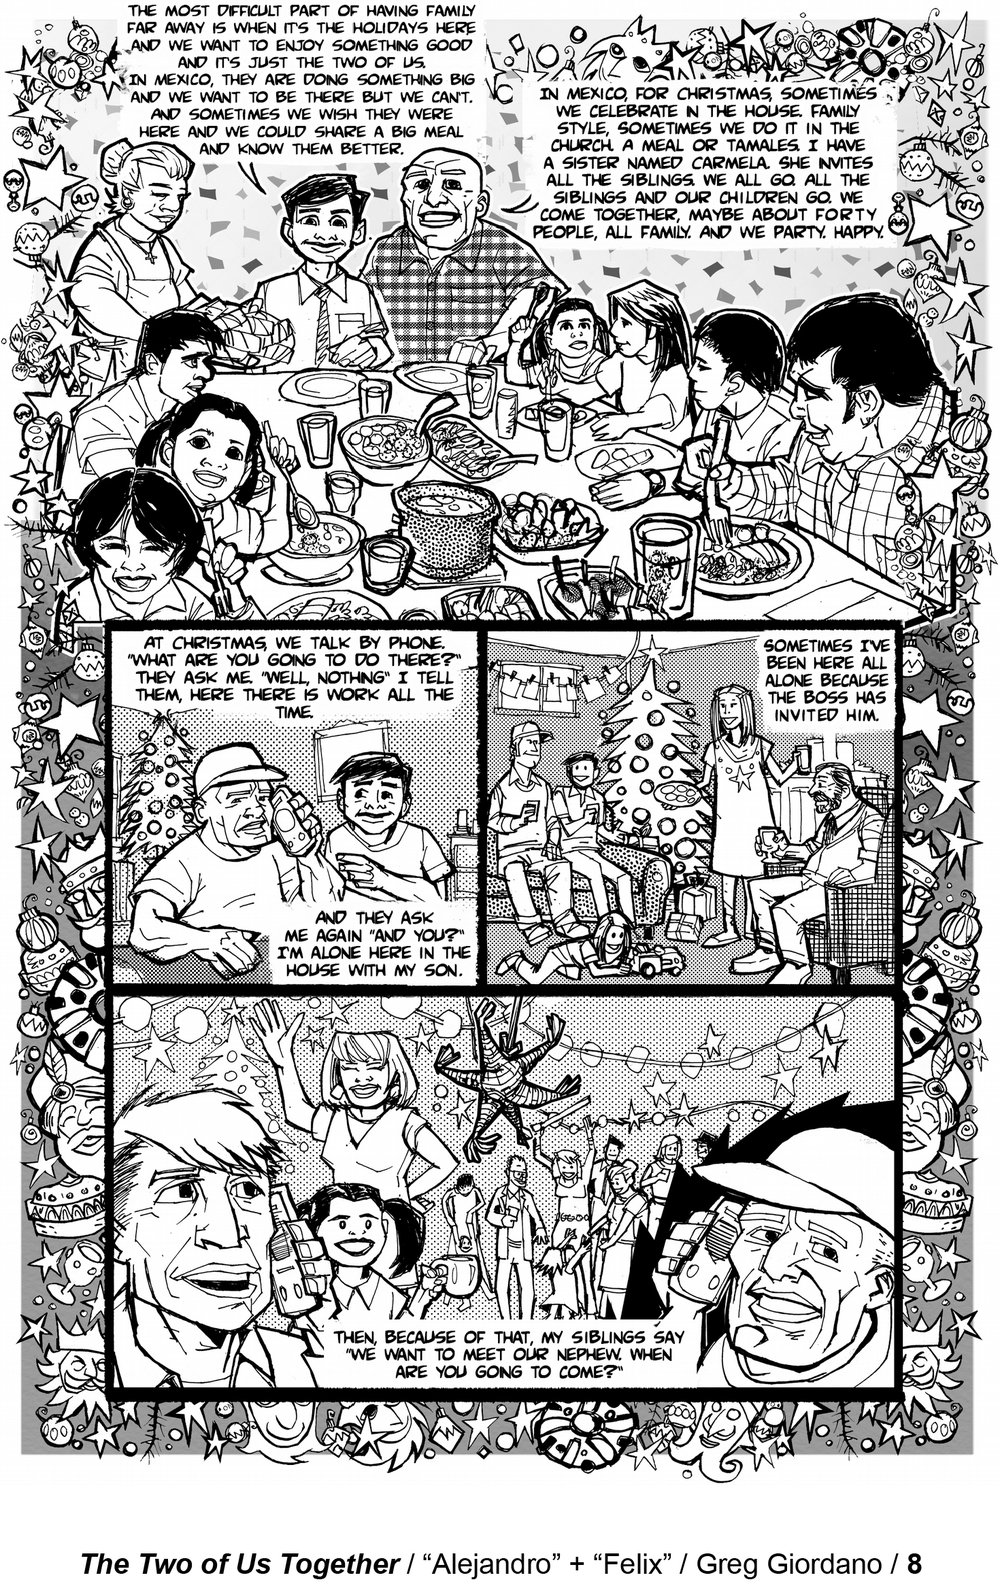 BOOKLET-Alejandro+Felix+Greg-171200-Digest_ENG 10.jpg